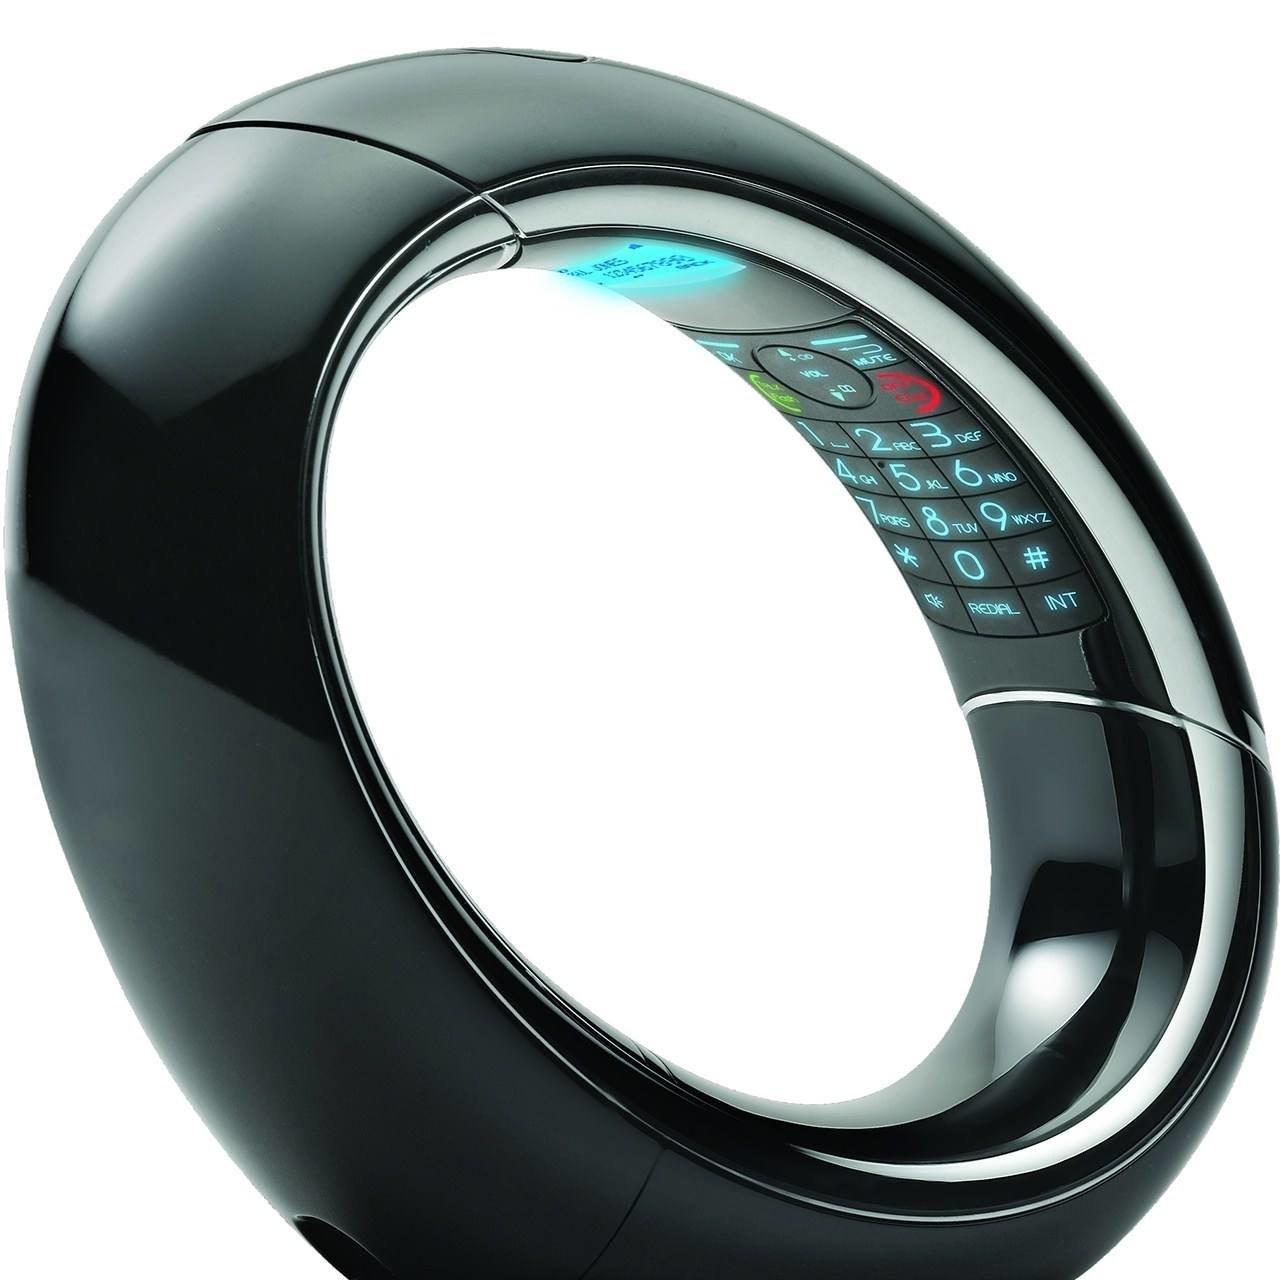 عکس تلفن بی سیم آ ا گ مدل Eclipse 10 AEG Eclipse 10 Wireless Phone تلفن-بی-سیم-ا-ا-گ-مدل-eclipse-10